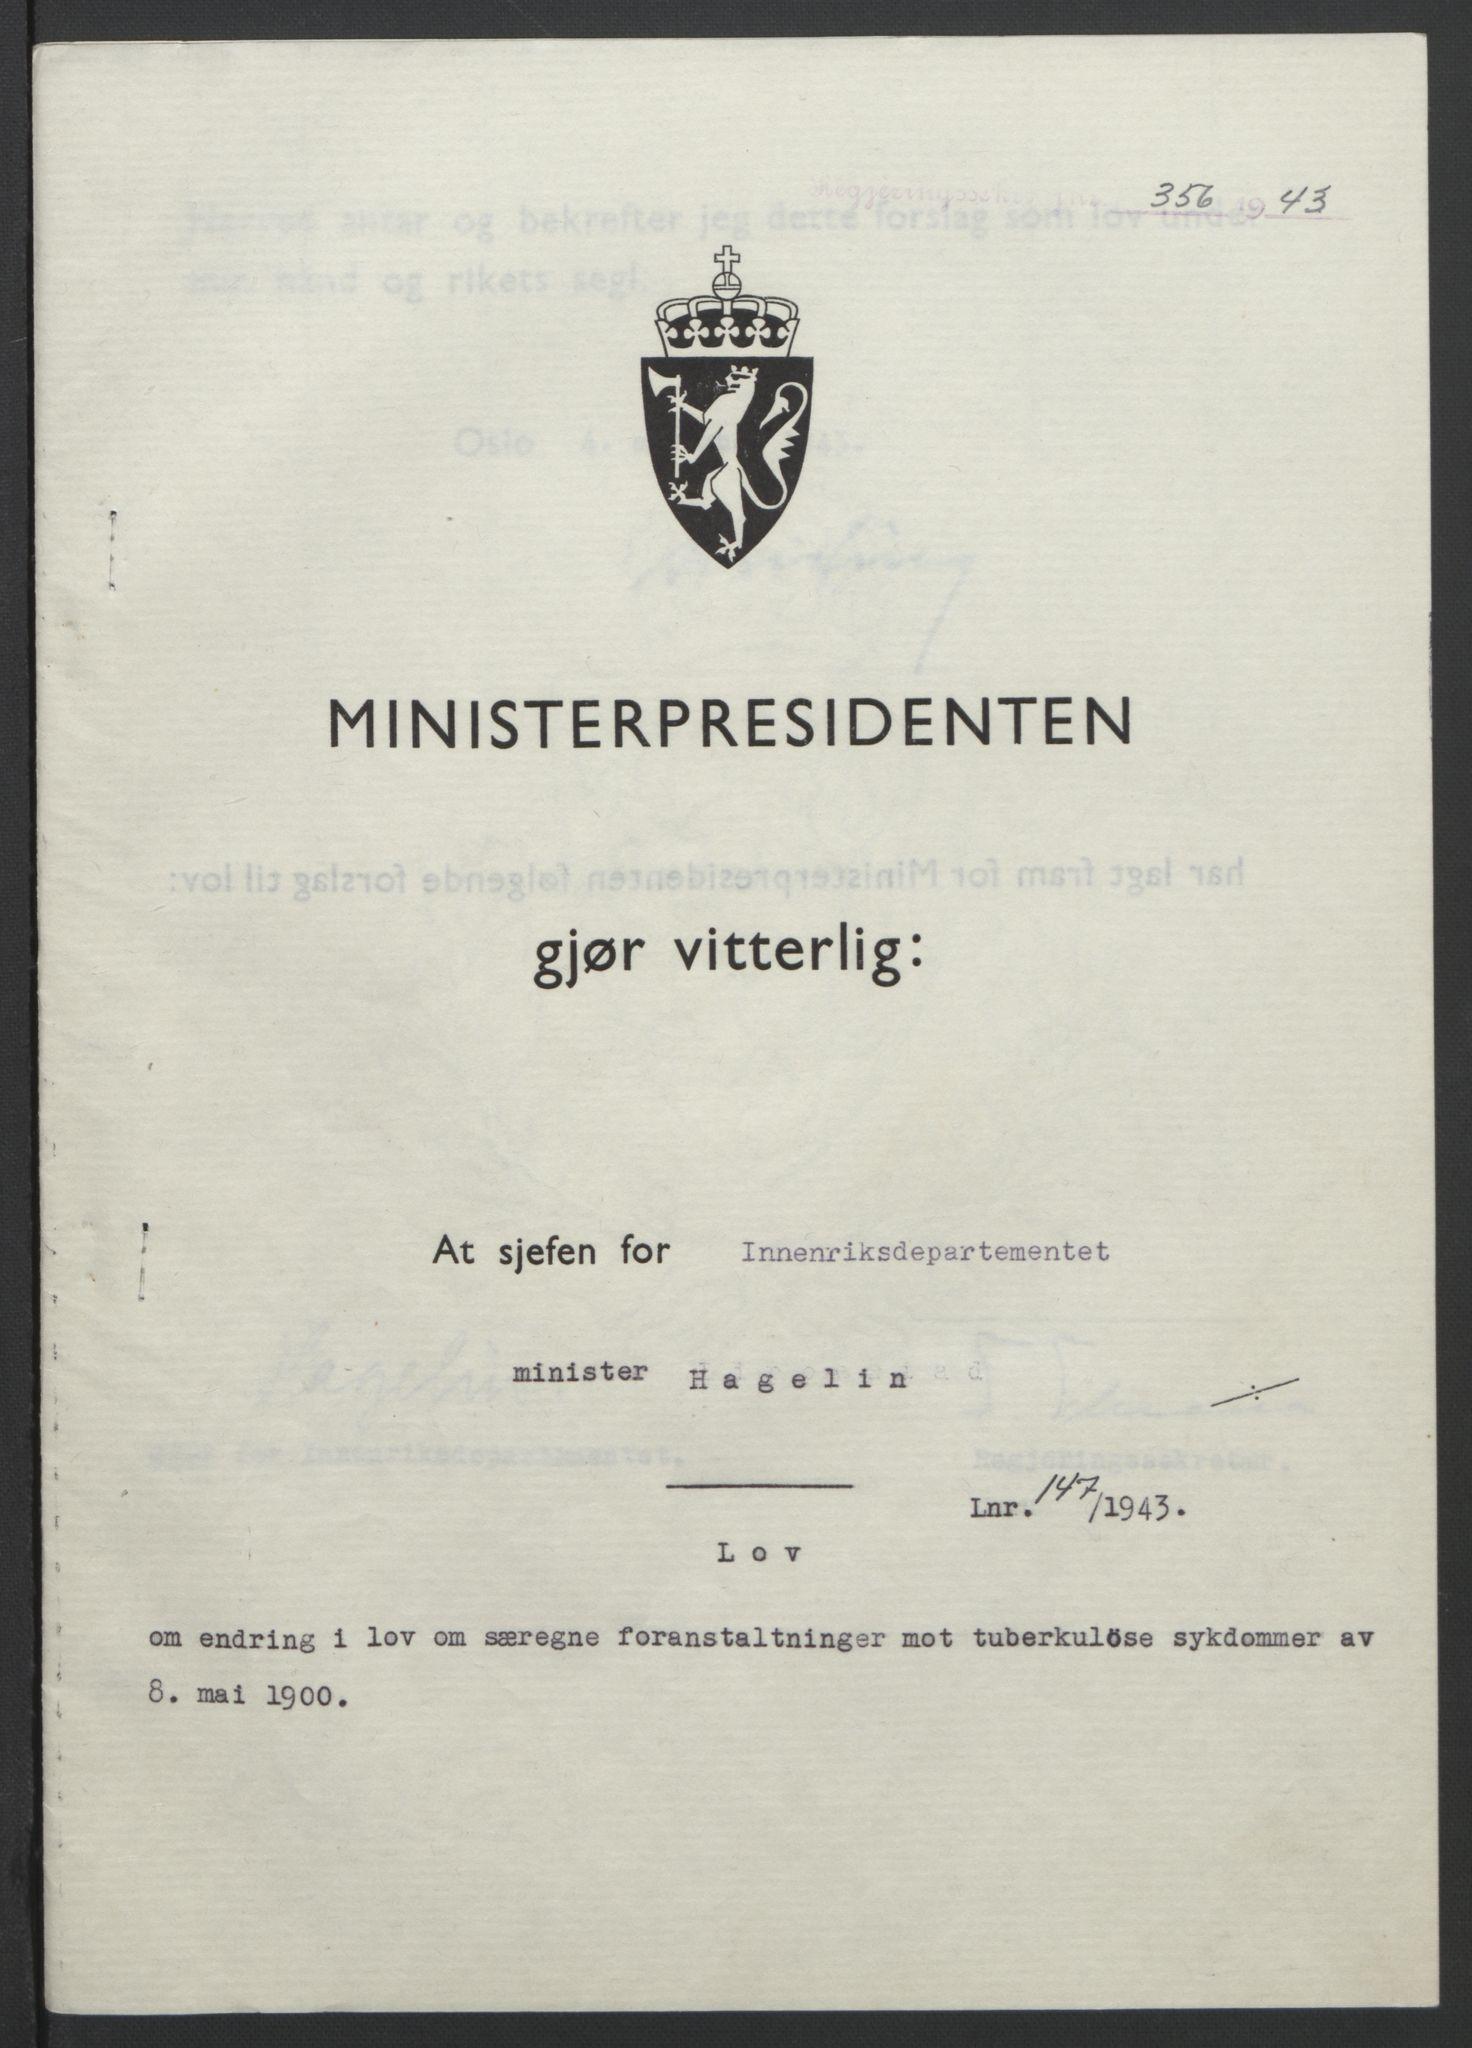 RA, NS-administrasjonen 1940-1945 (Statsrådsekretariatet, de kommisariske statsråder mm), D/Db/L0099: Lover, 1943, s. 688